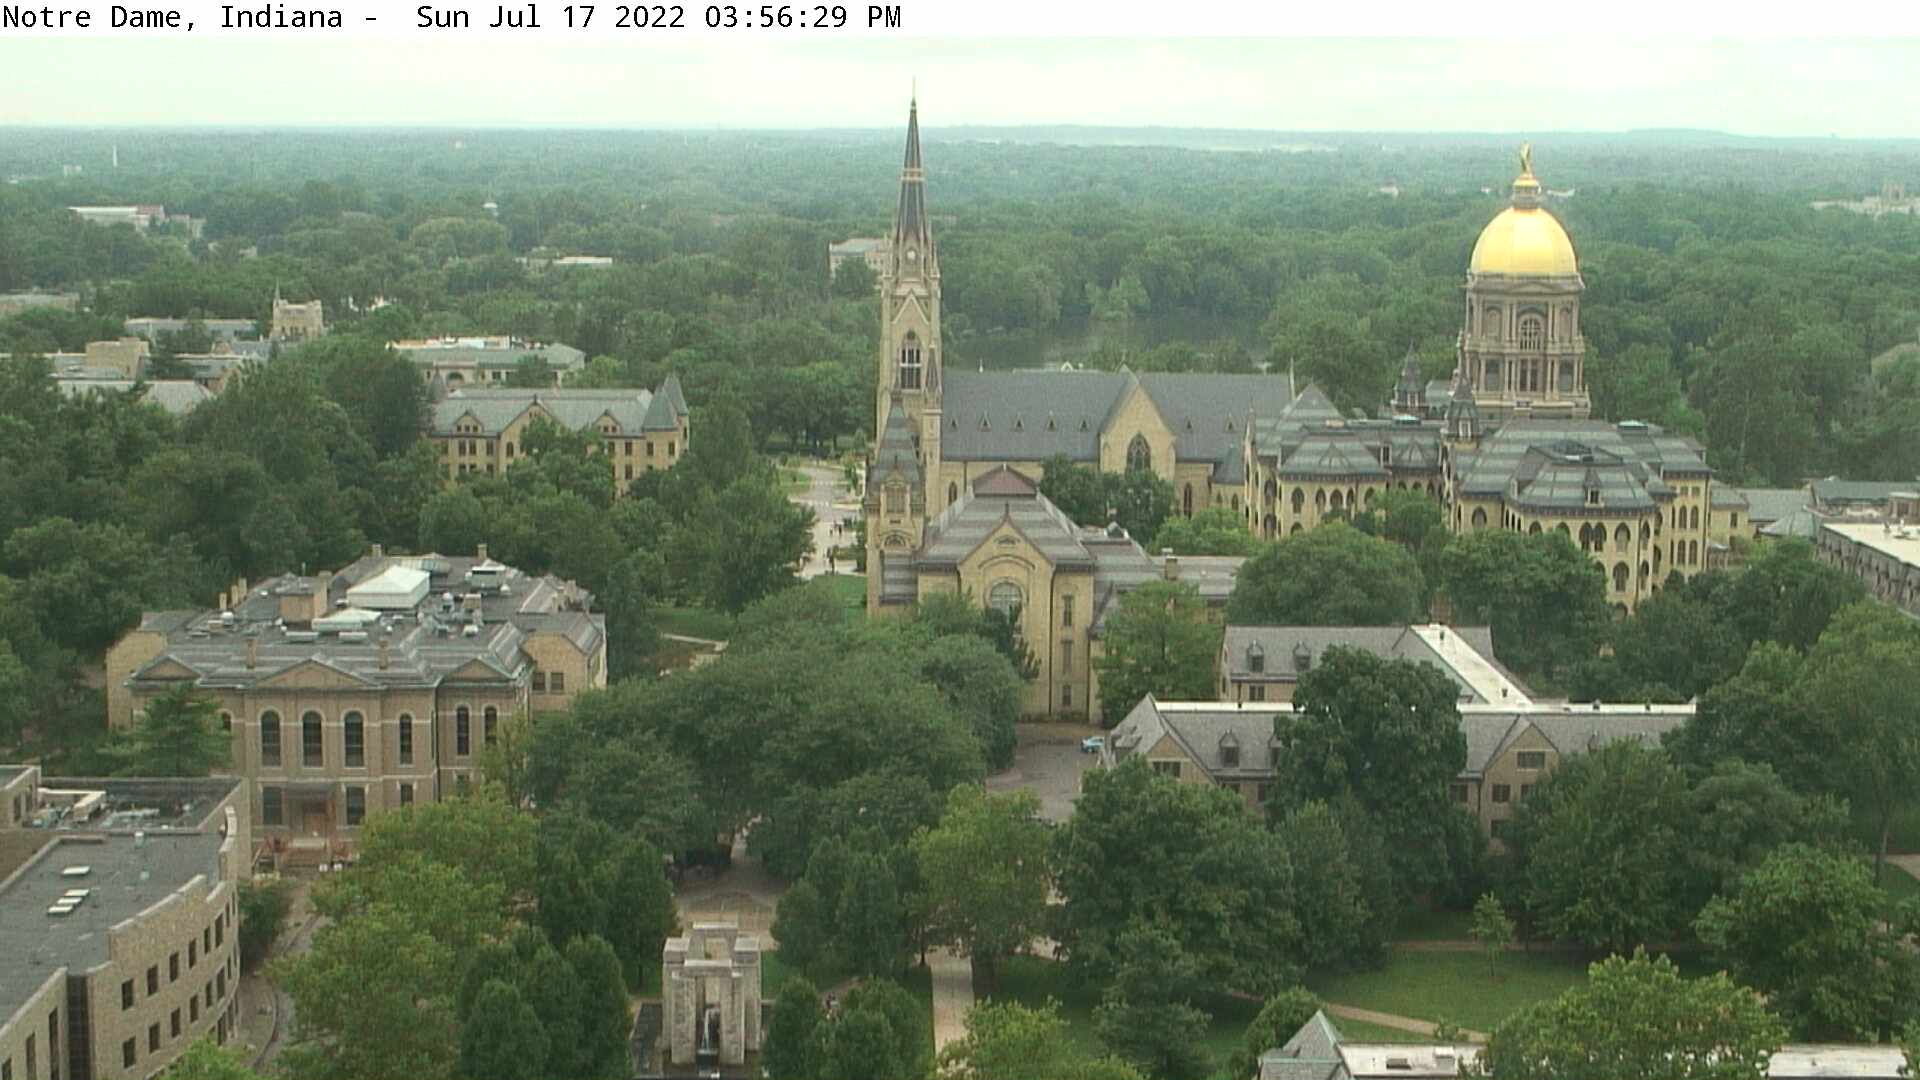 Notre Dame, Indiana Sat. 15:57